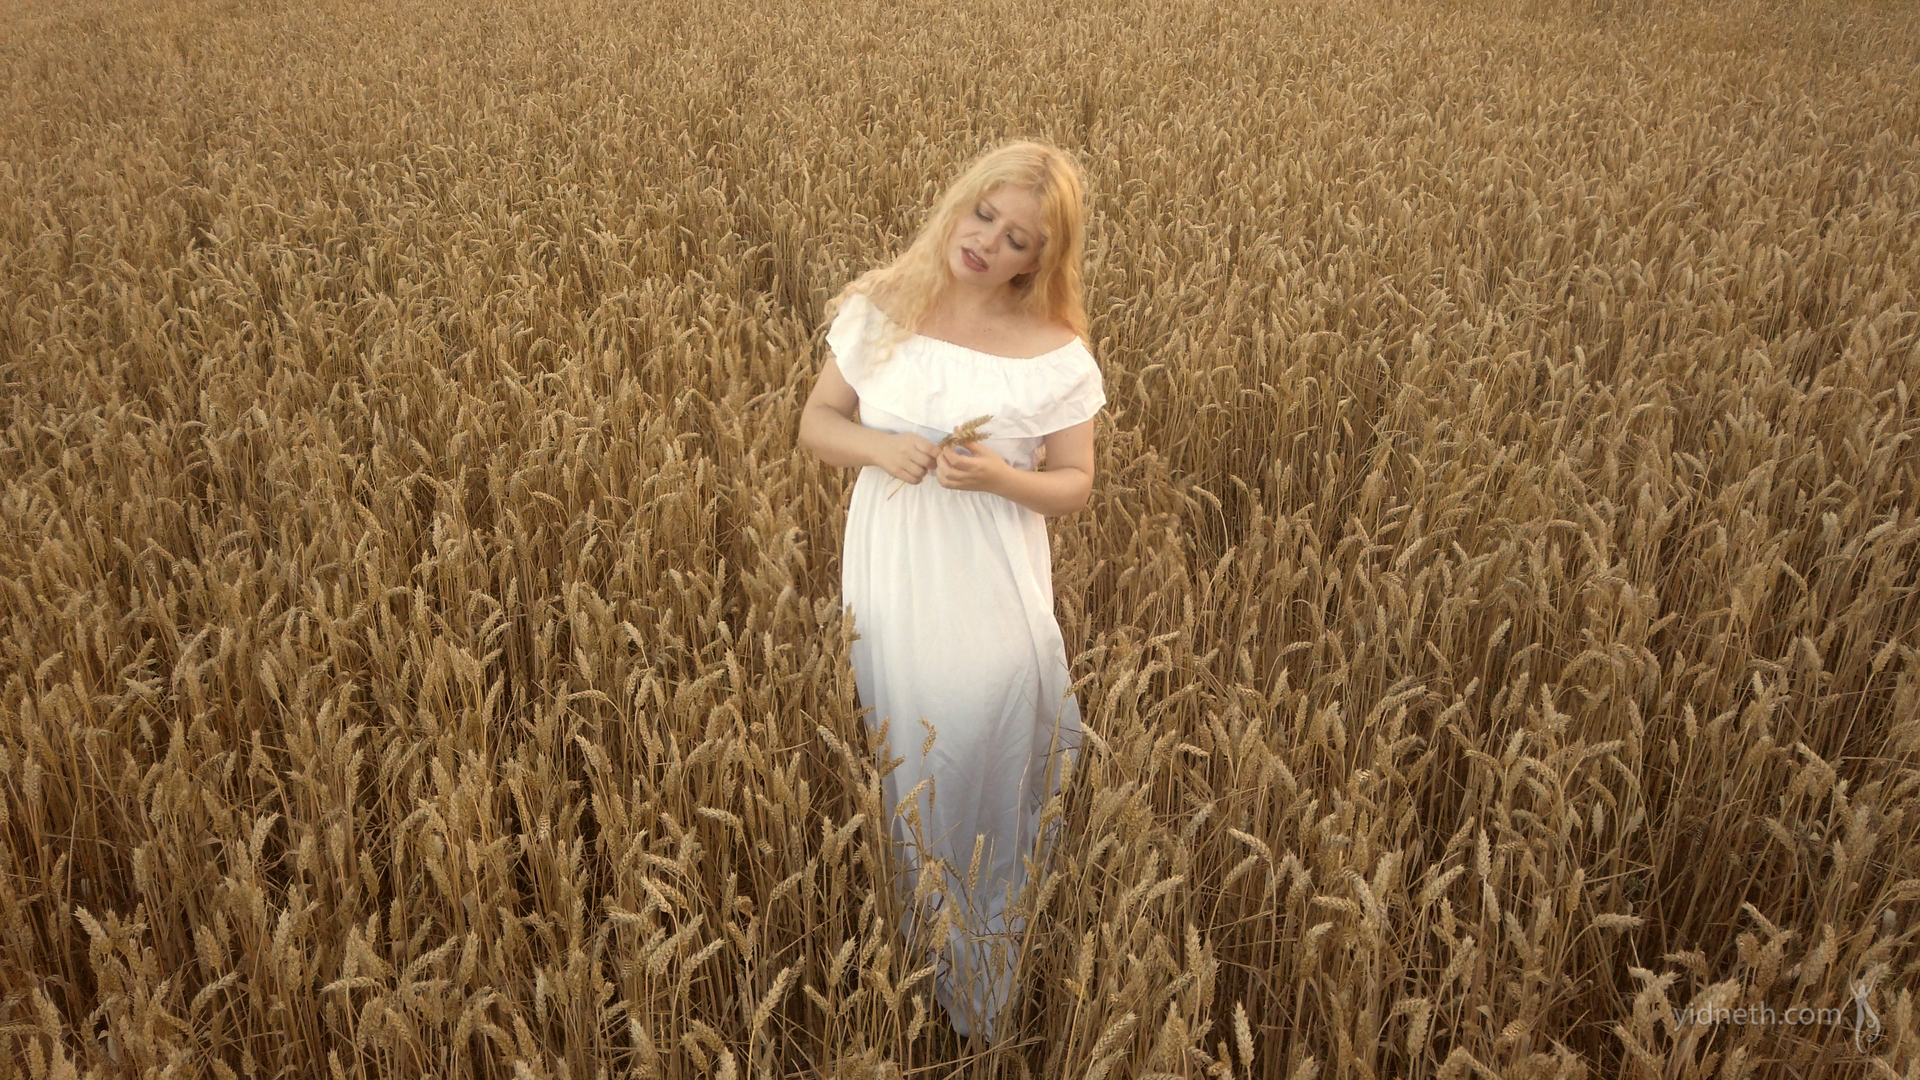 Priscilla Hernandez_fields of gold (2).jpg